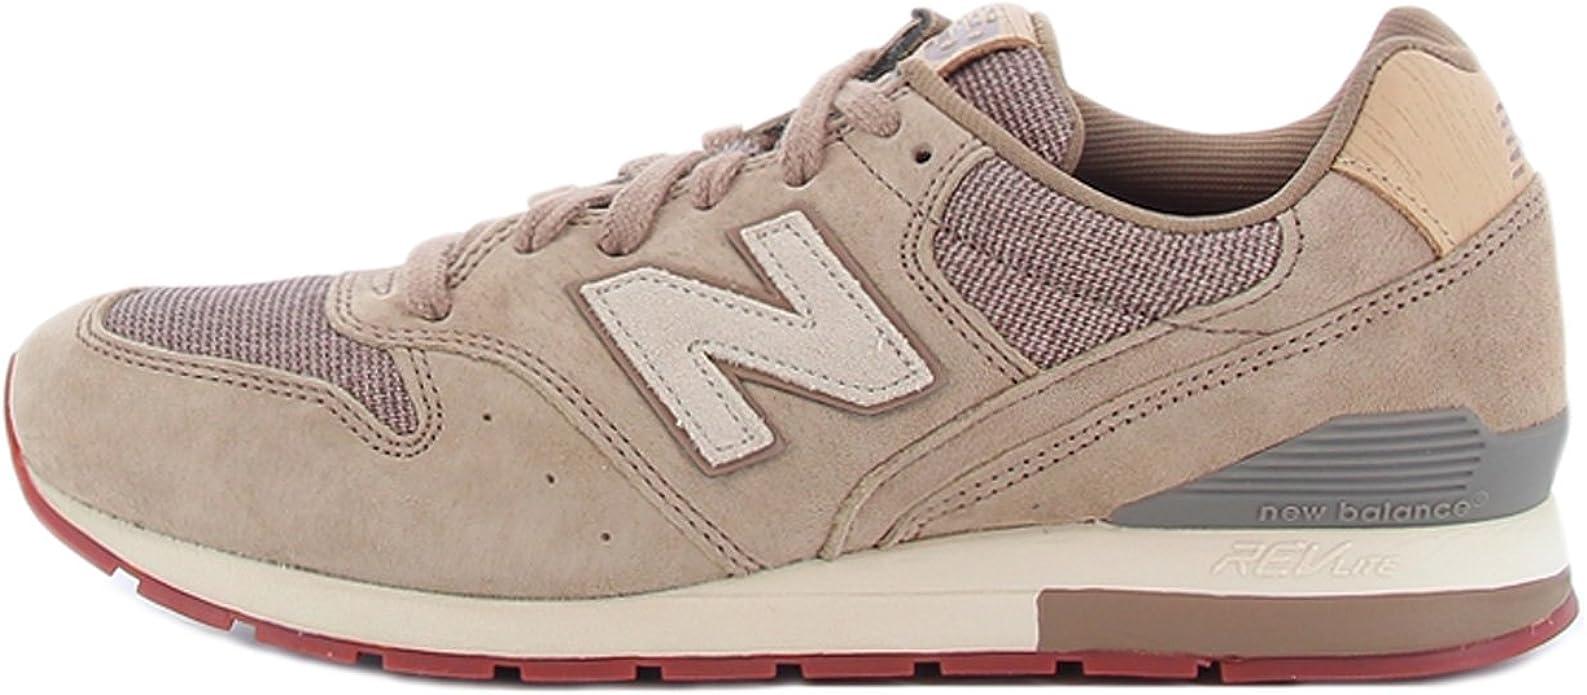 new balance beige shoes